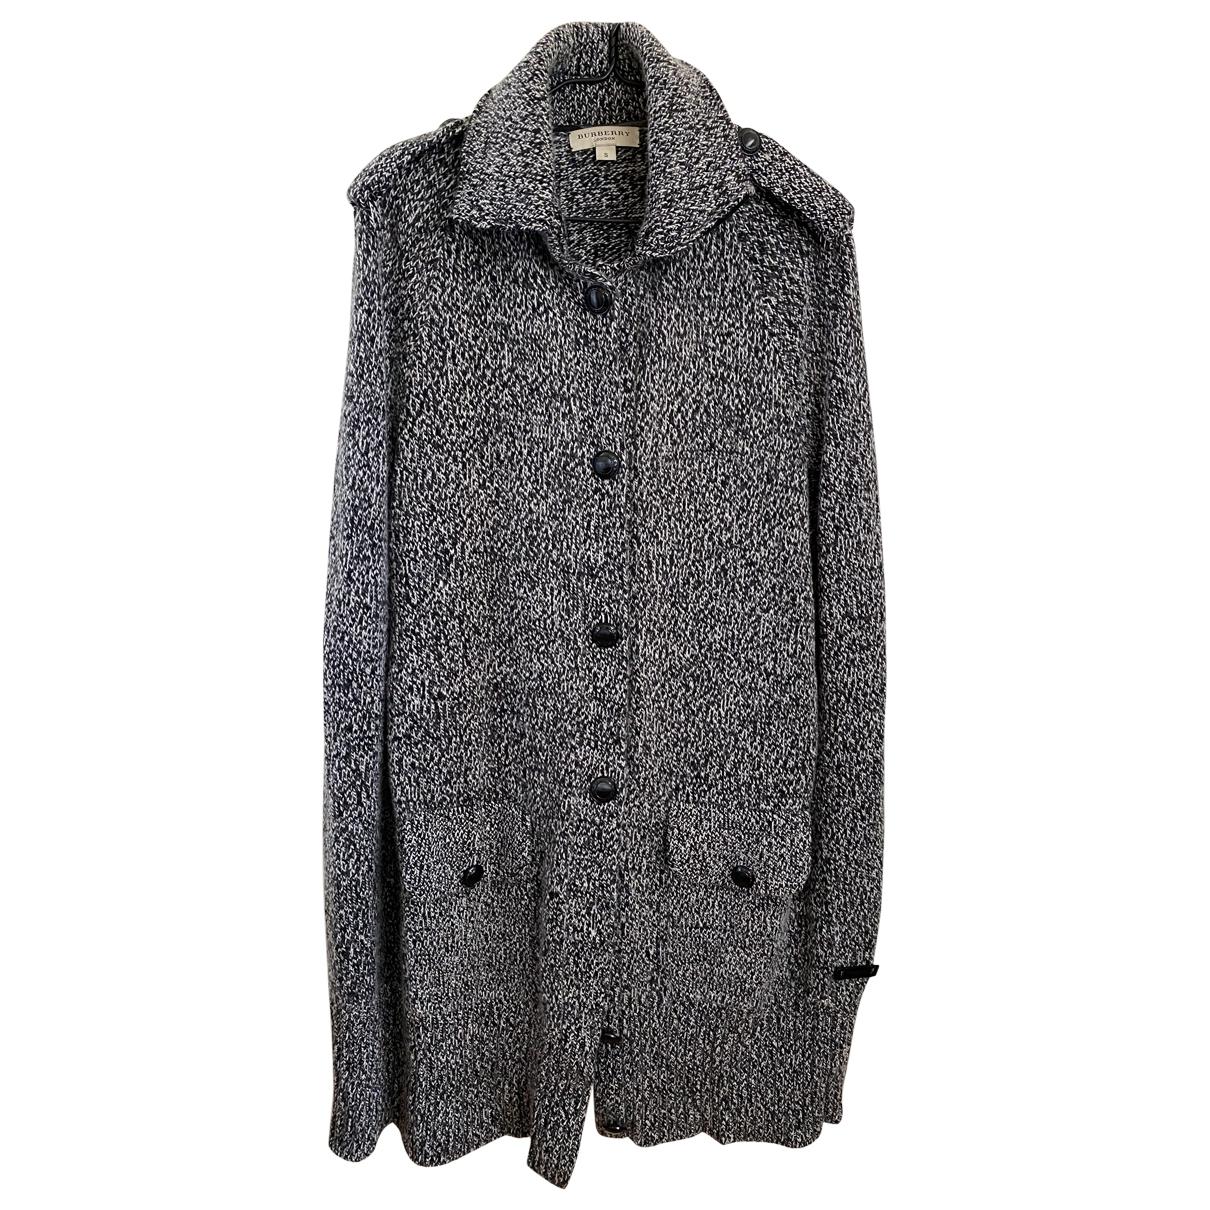 Burberry \N Cotton coat for Women S International